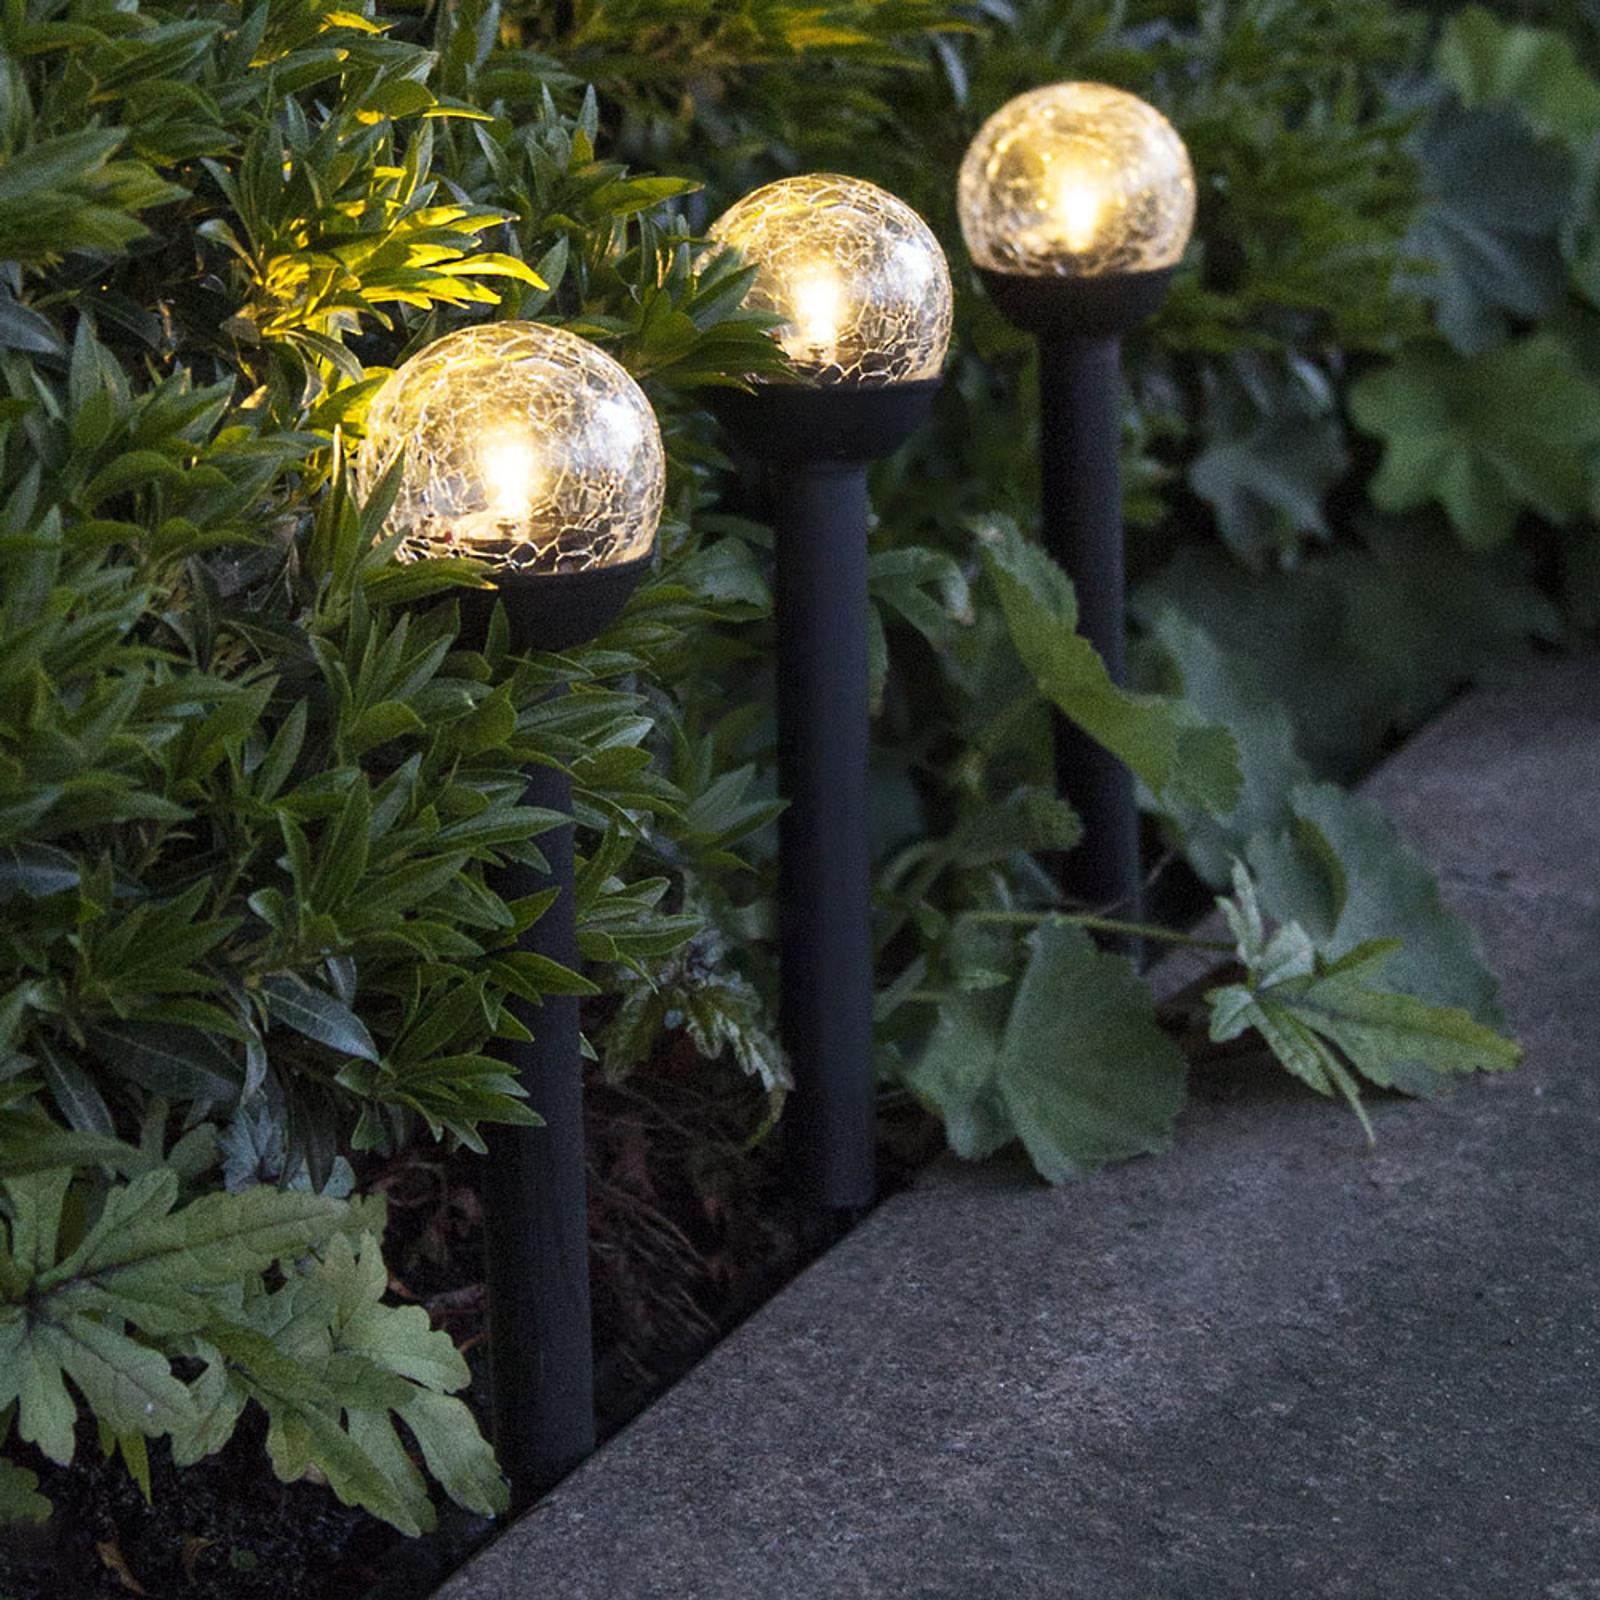 Lampa solarna LED Roma, zestaw trzech sztuk